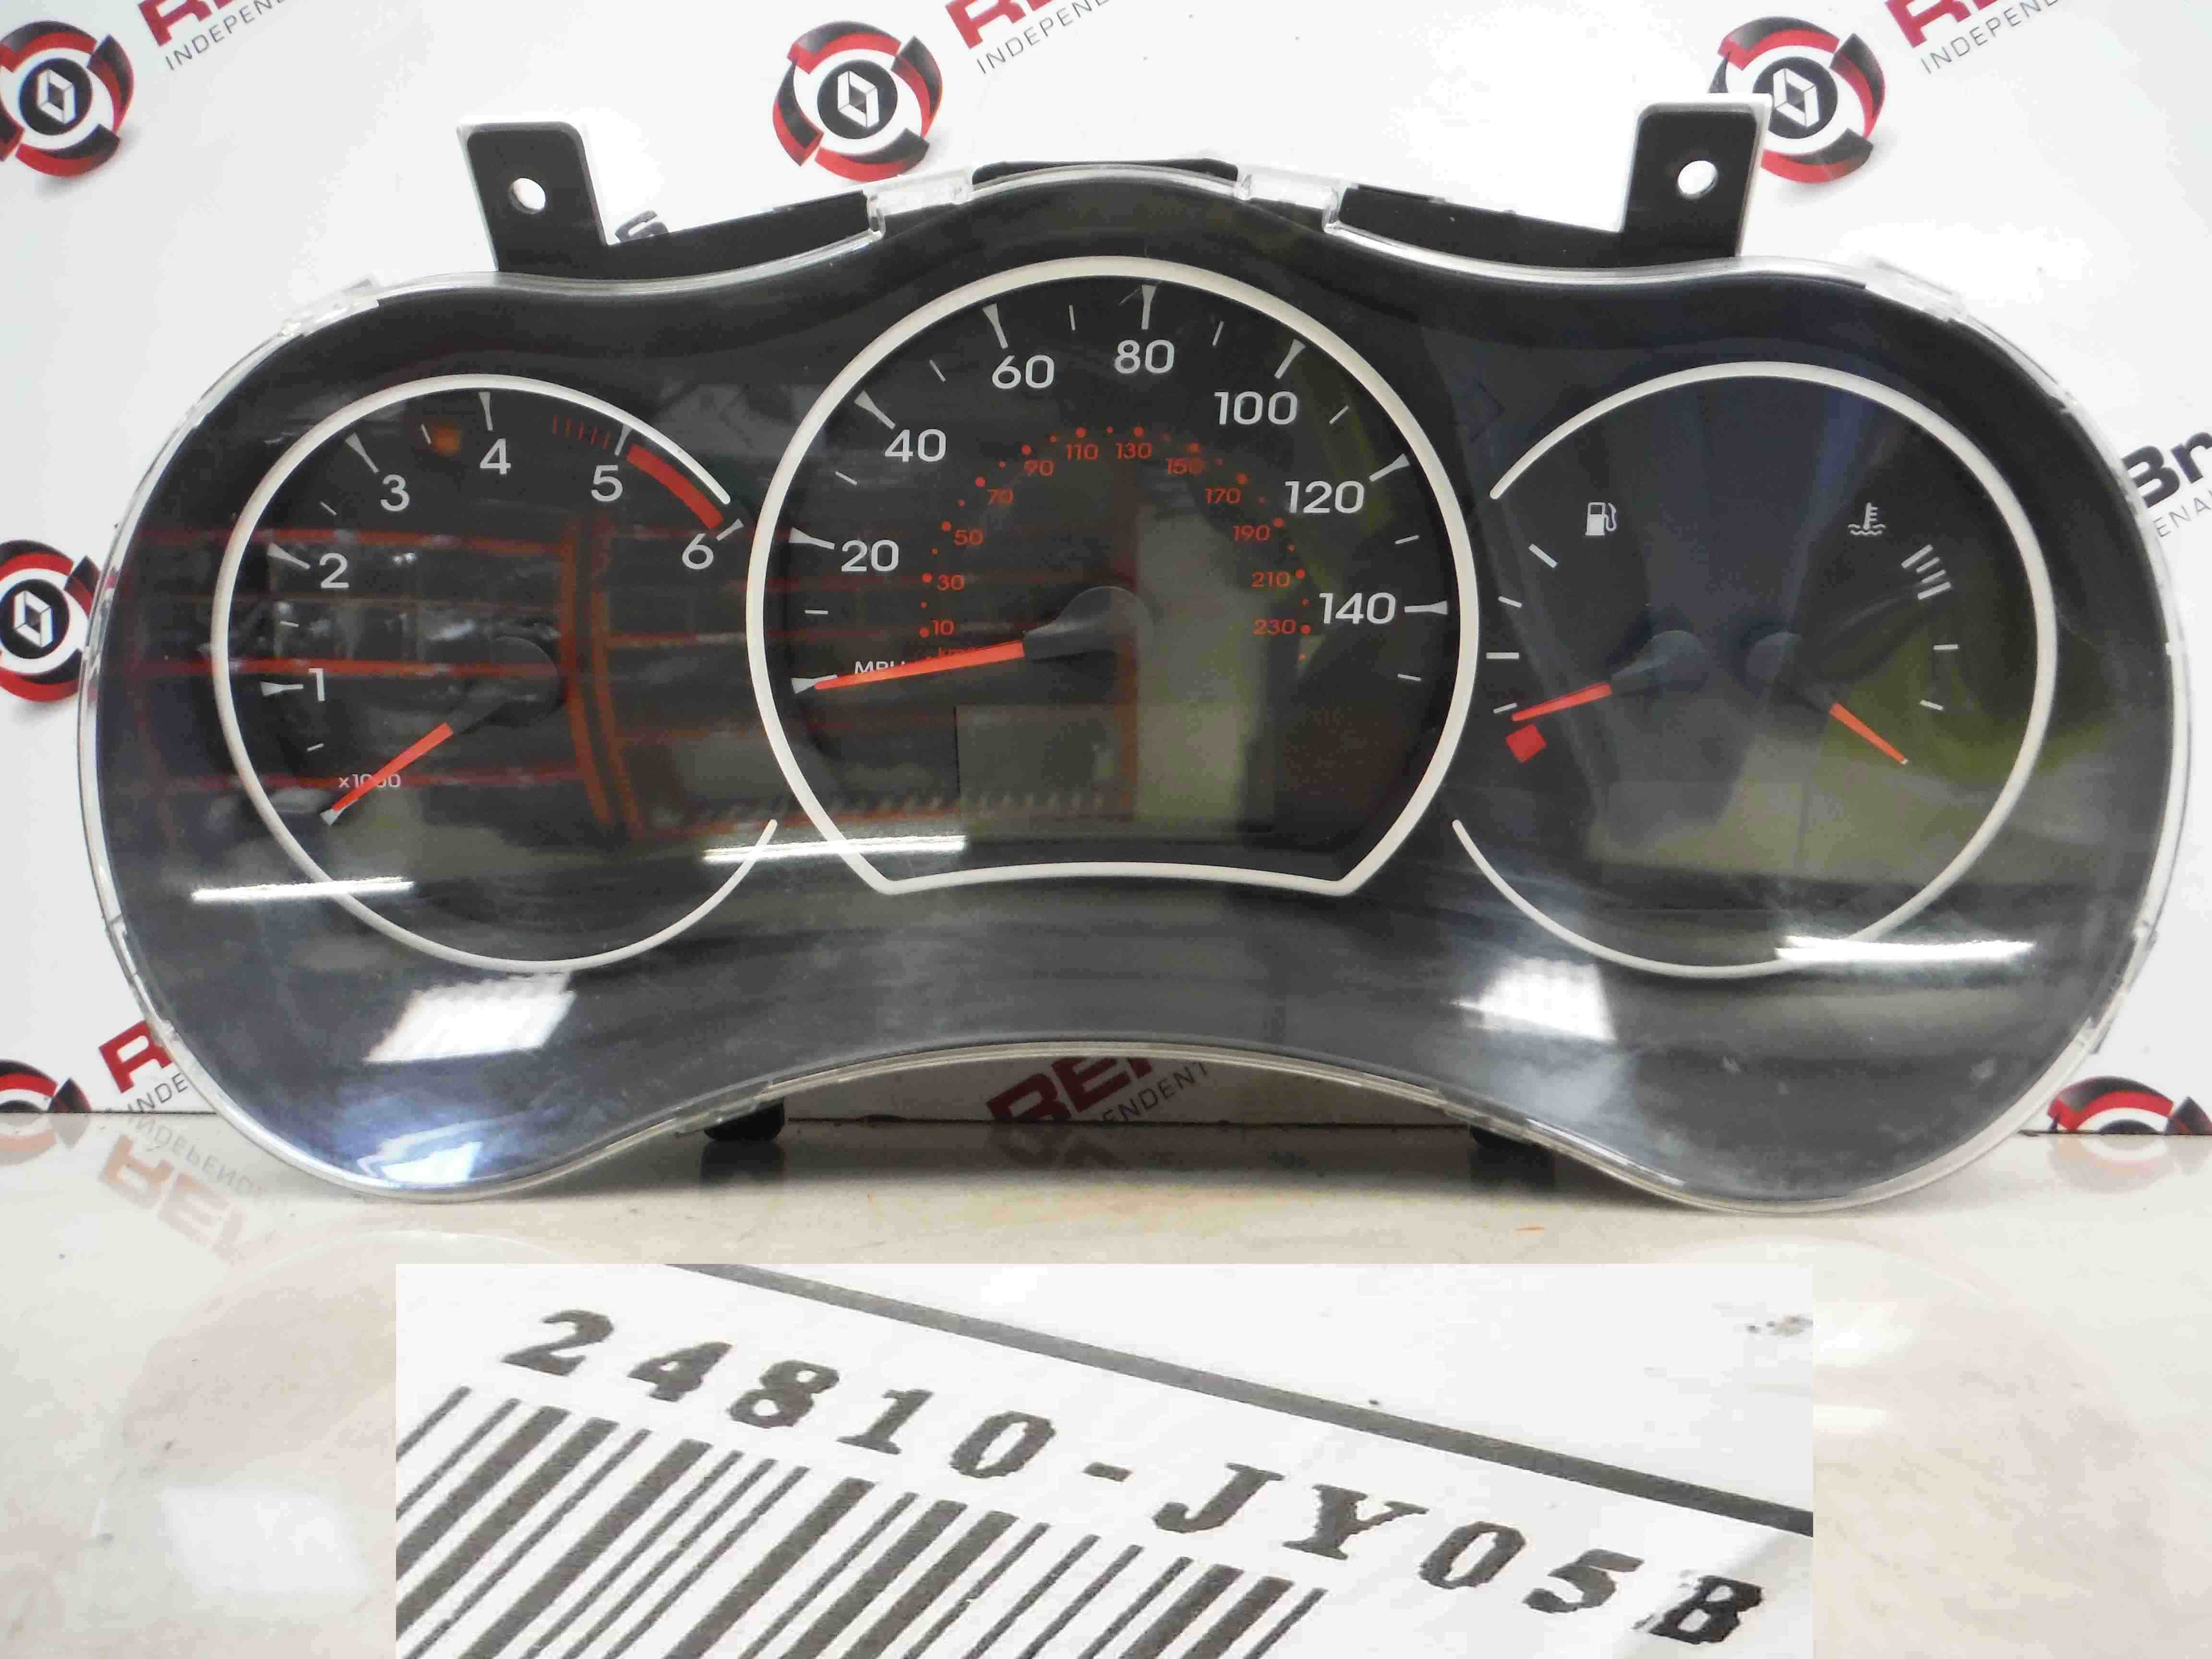 Renault Koleos 2008-2015 Instrument Panel Dials Clocks Gauges 99k 24810JY05B